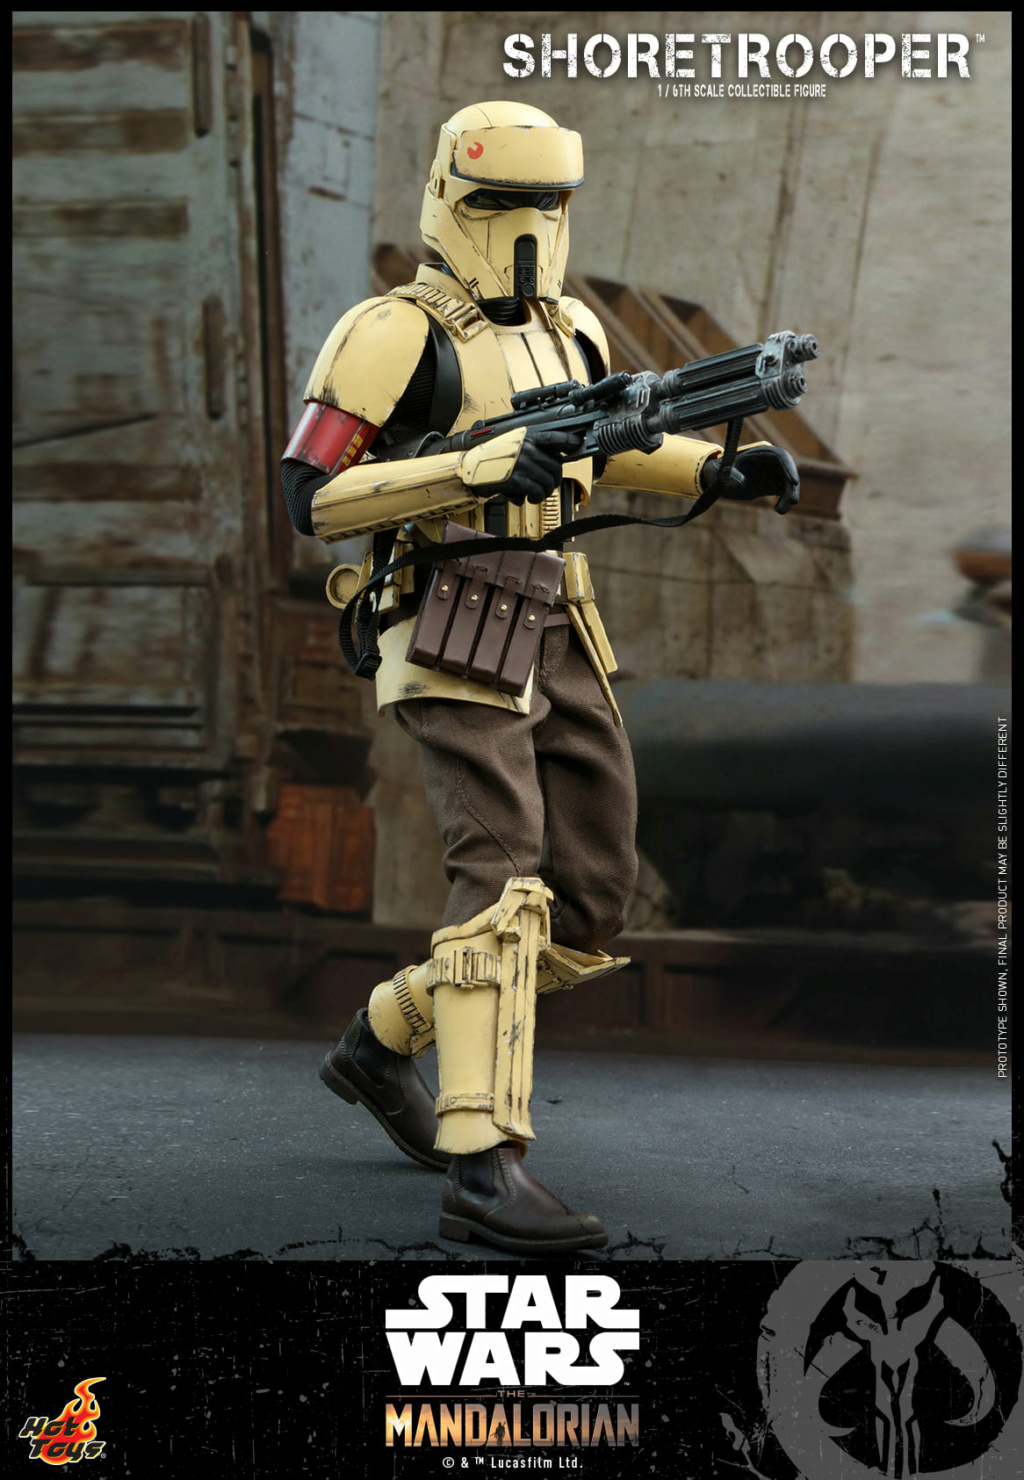 Shoretrooper 1/6 Collectible Figure The Mandalorian Hot Toys Shoret16